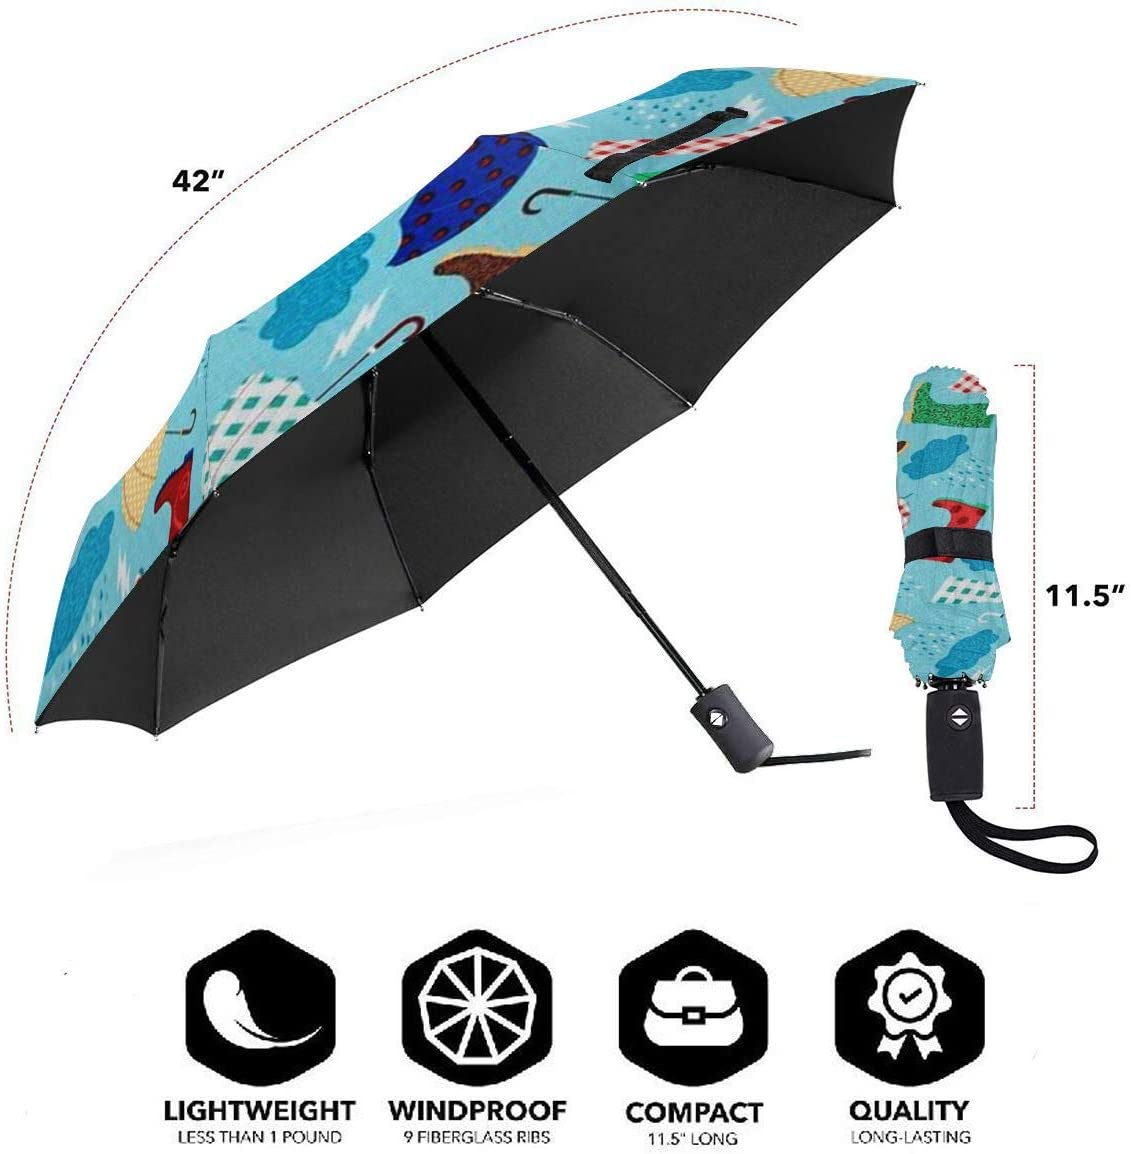 Rain Gear Umbrella Compact Rain/&Wind Repellent Umbrellas Sun Protection With Anti UV Coating Travel Auto Folding Umbrella